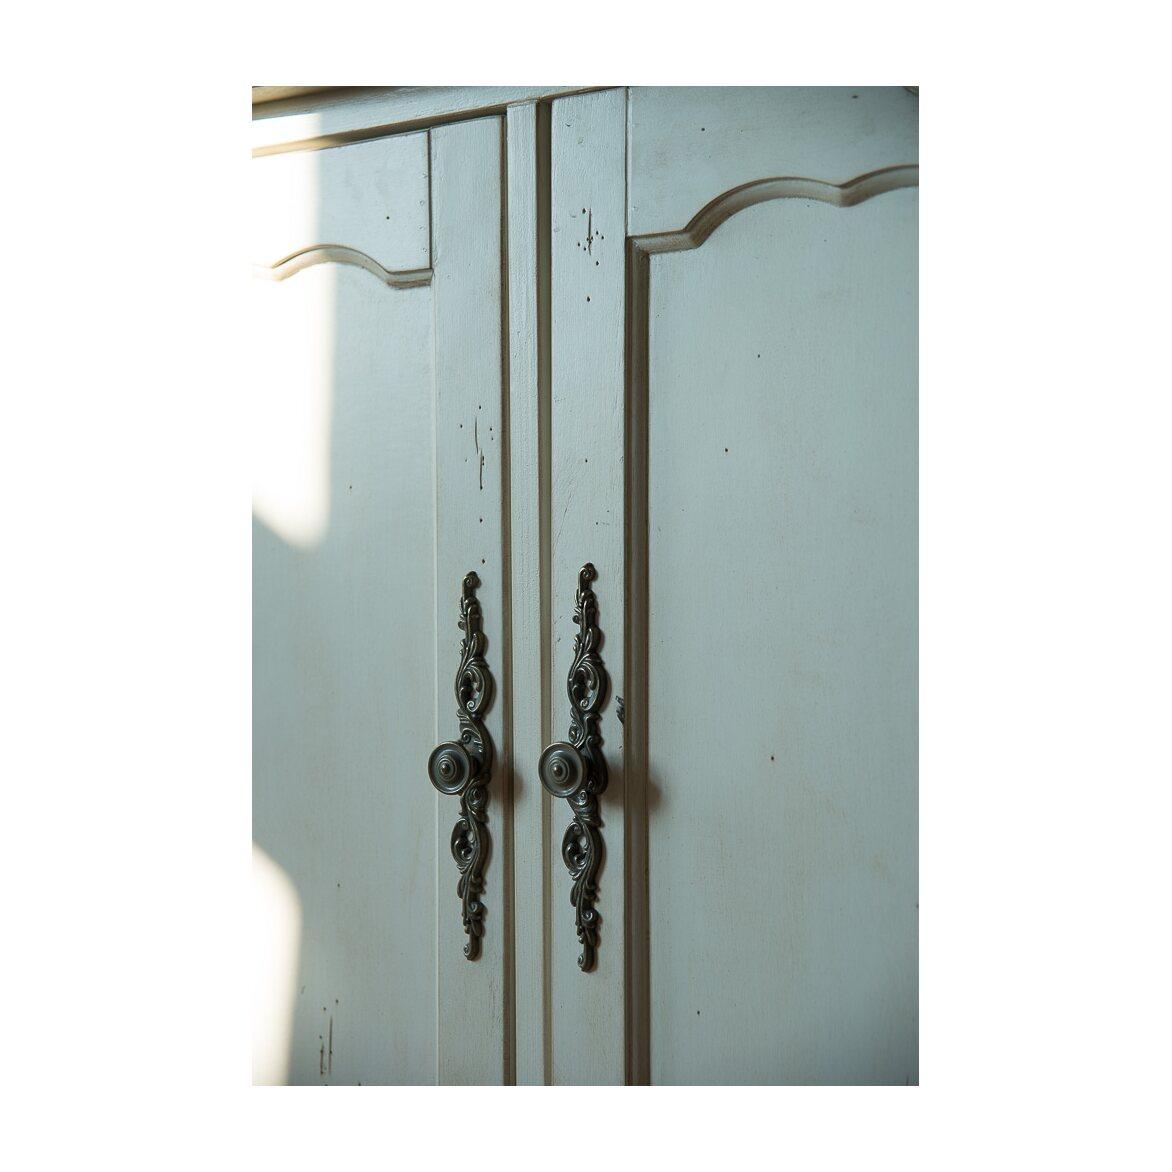 Буфет двухстворчатый Leontina, лавандового цвета 4 | Буфеты Kingsby